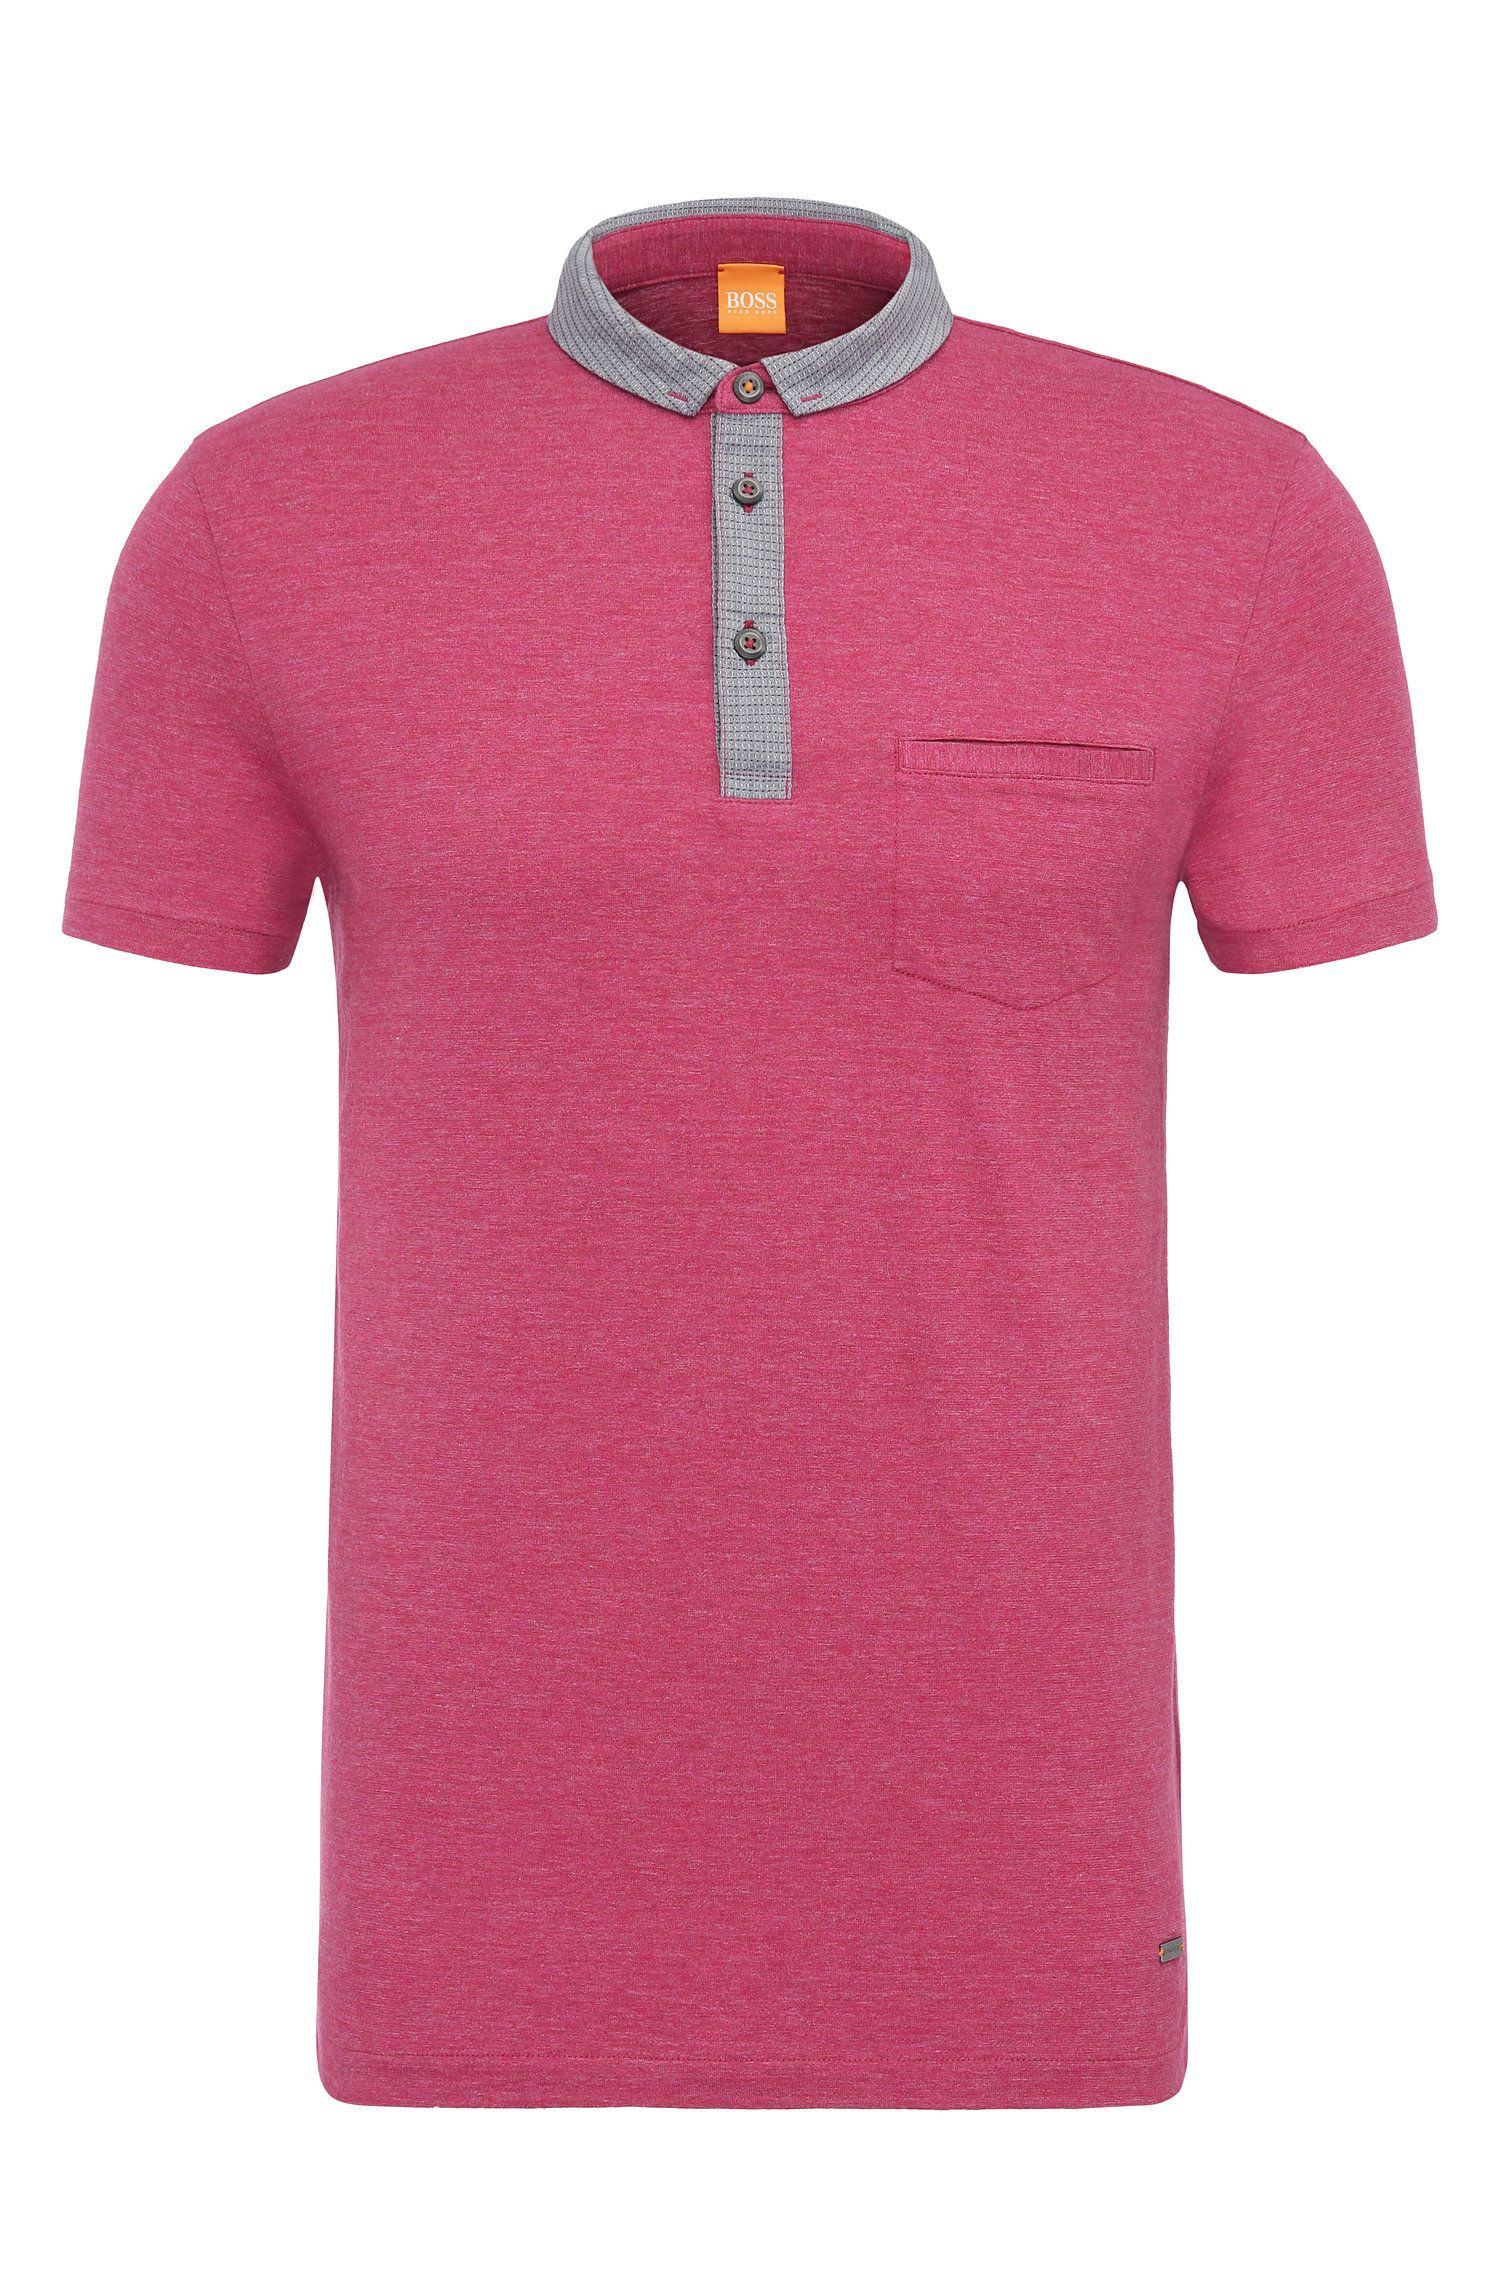 'Patcherman 1' | Regular Fit, Marled Cotton Polo Shirt